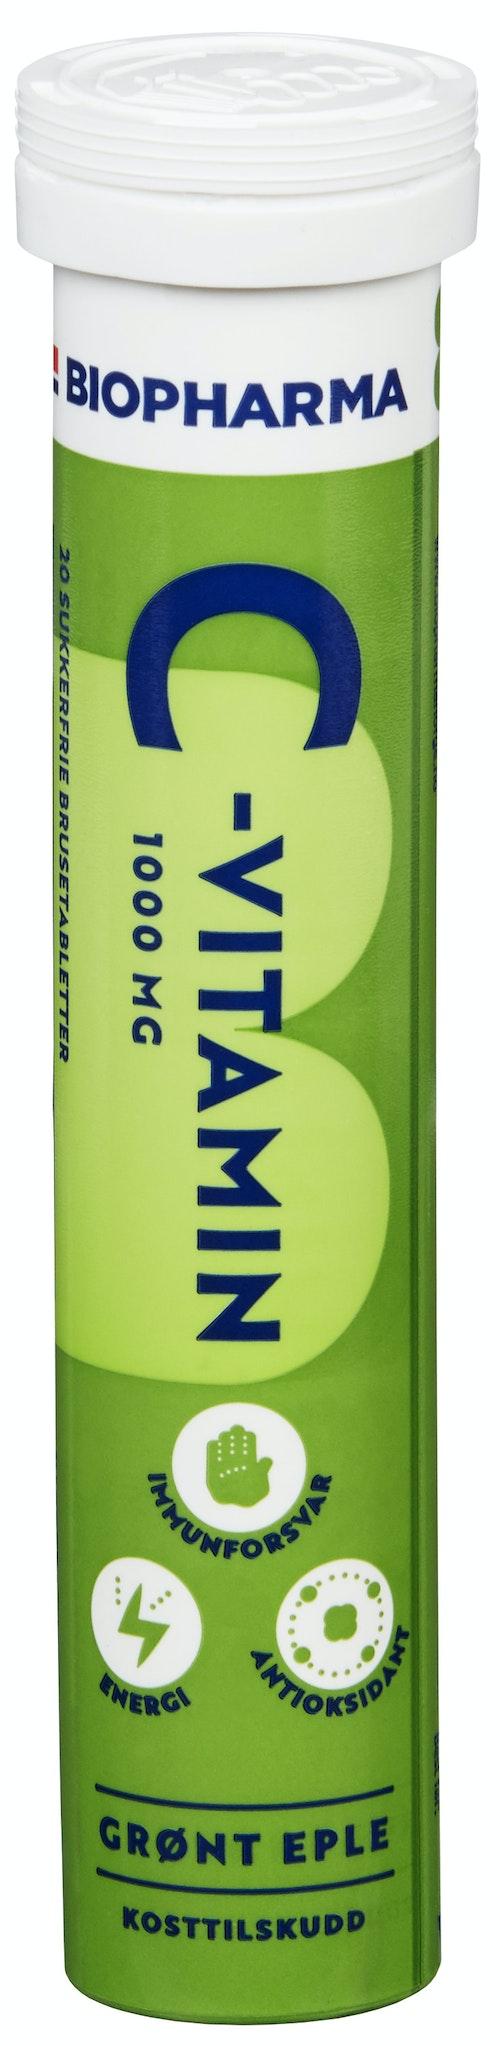 Biopharma C vitamin brusetab Eple 20 stk